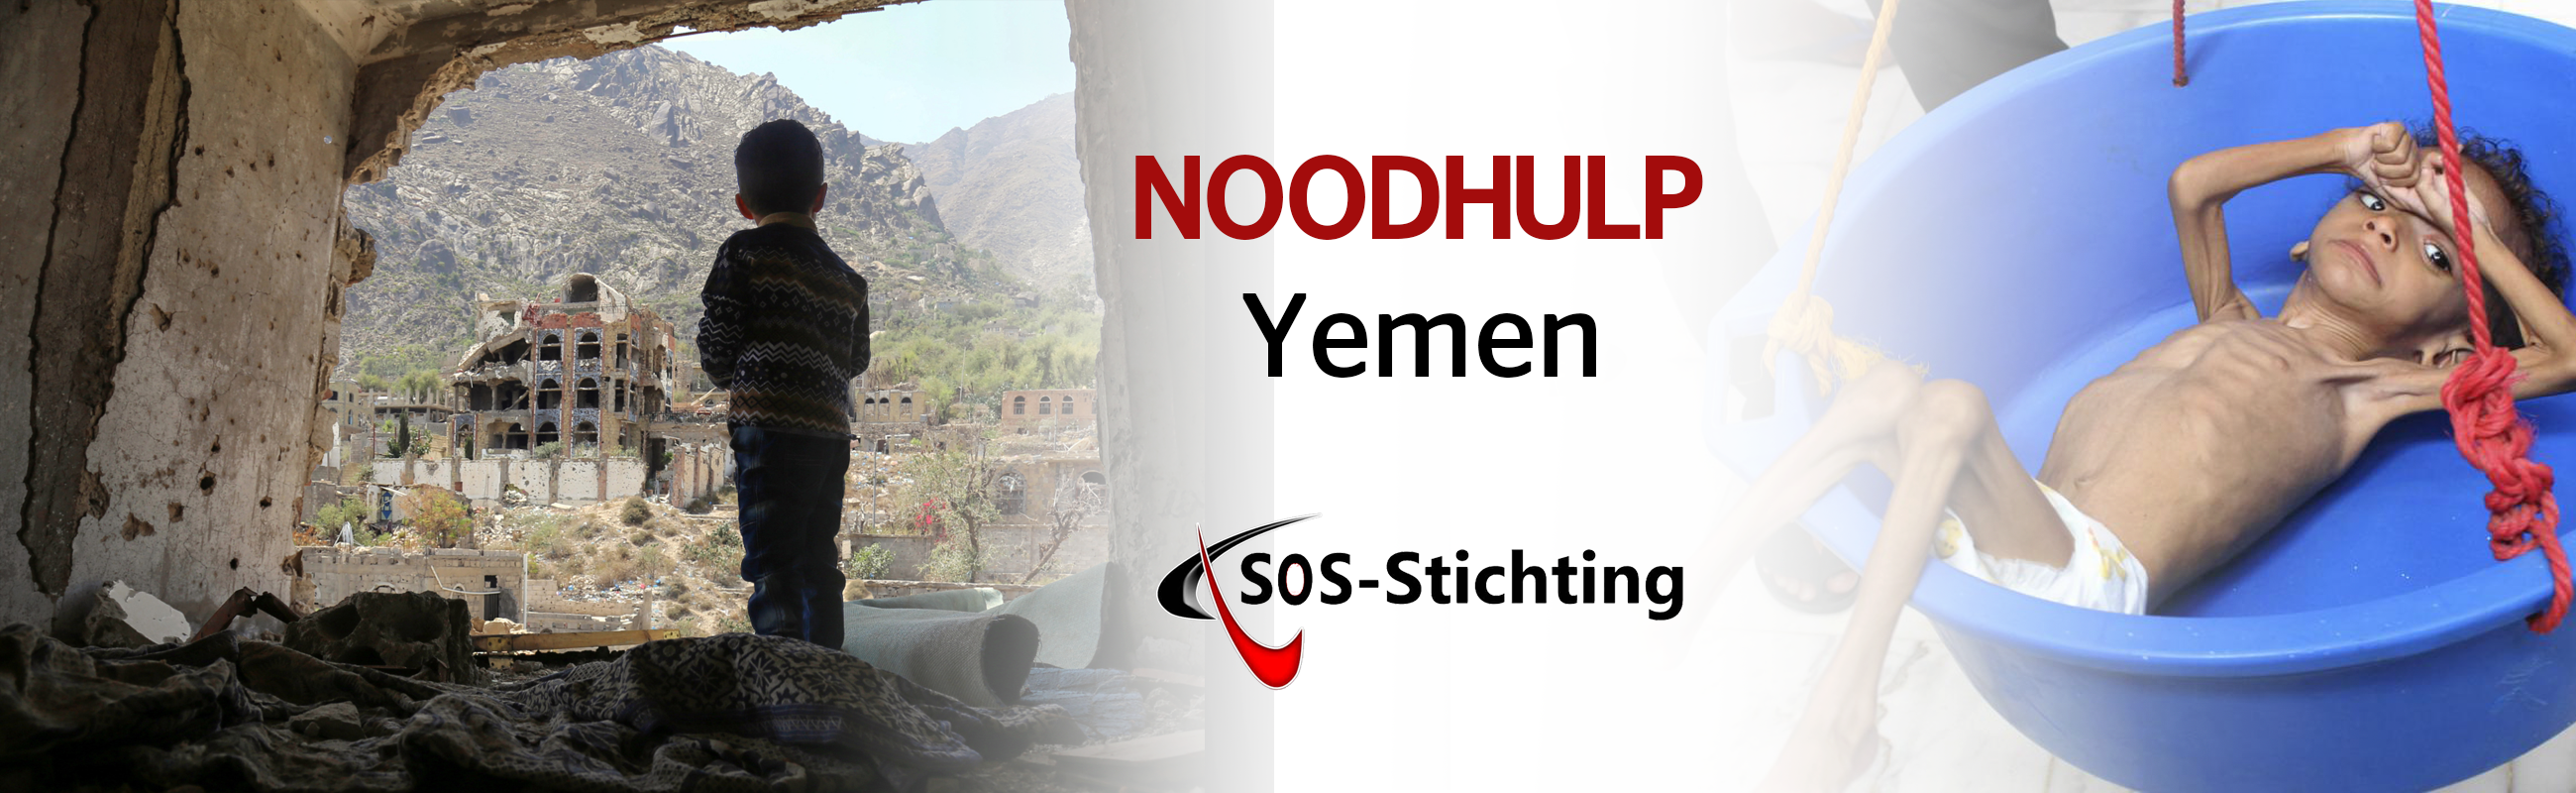 banner Yemen